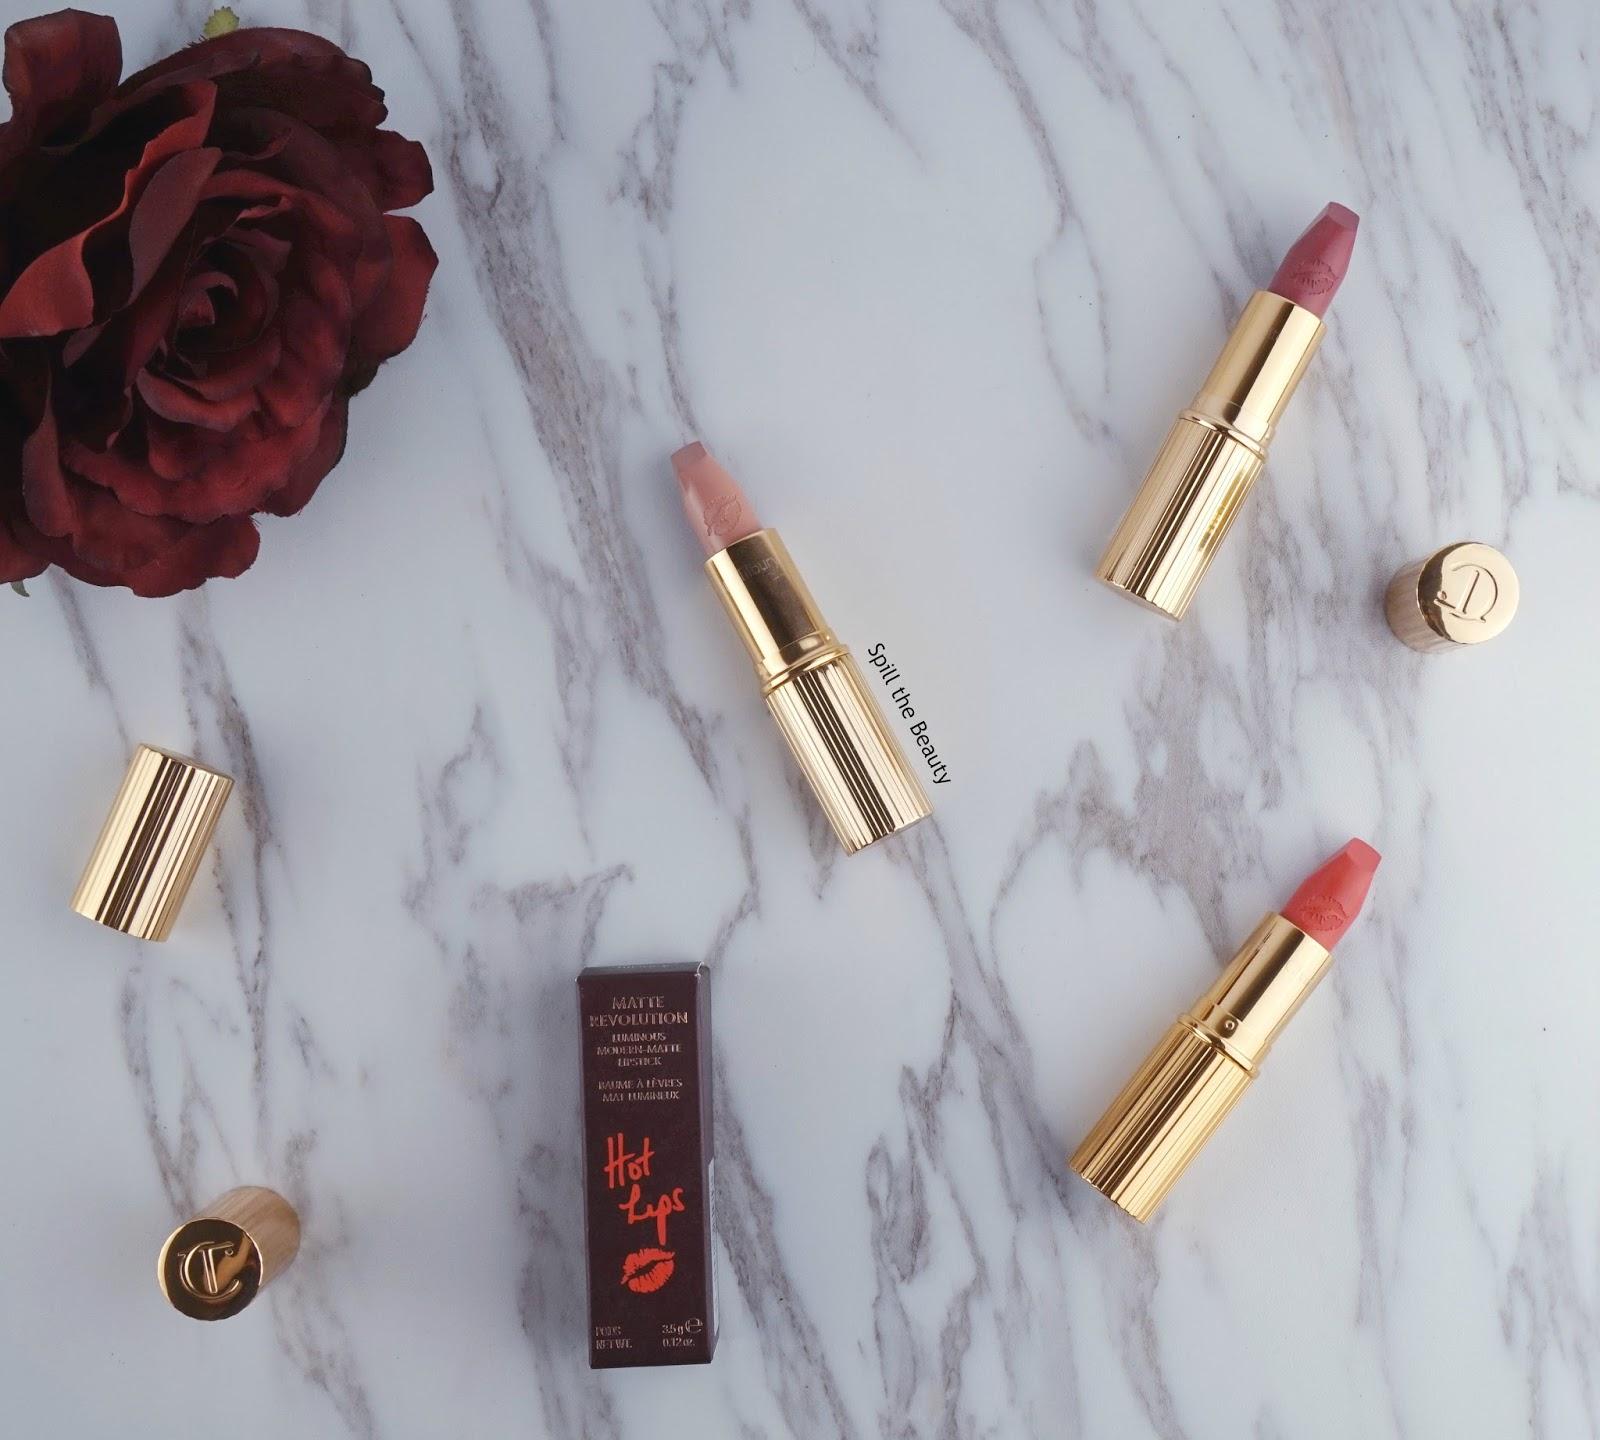 charlotte tilbury hot lips lipstick secret salma kim k.w. miranda may review swatches look